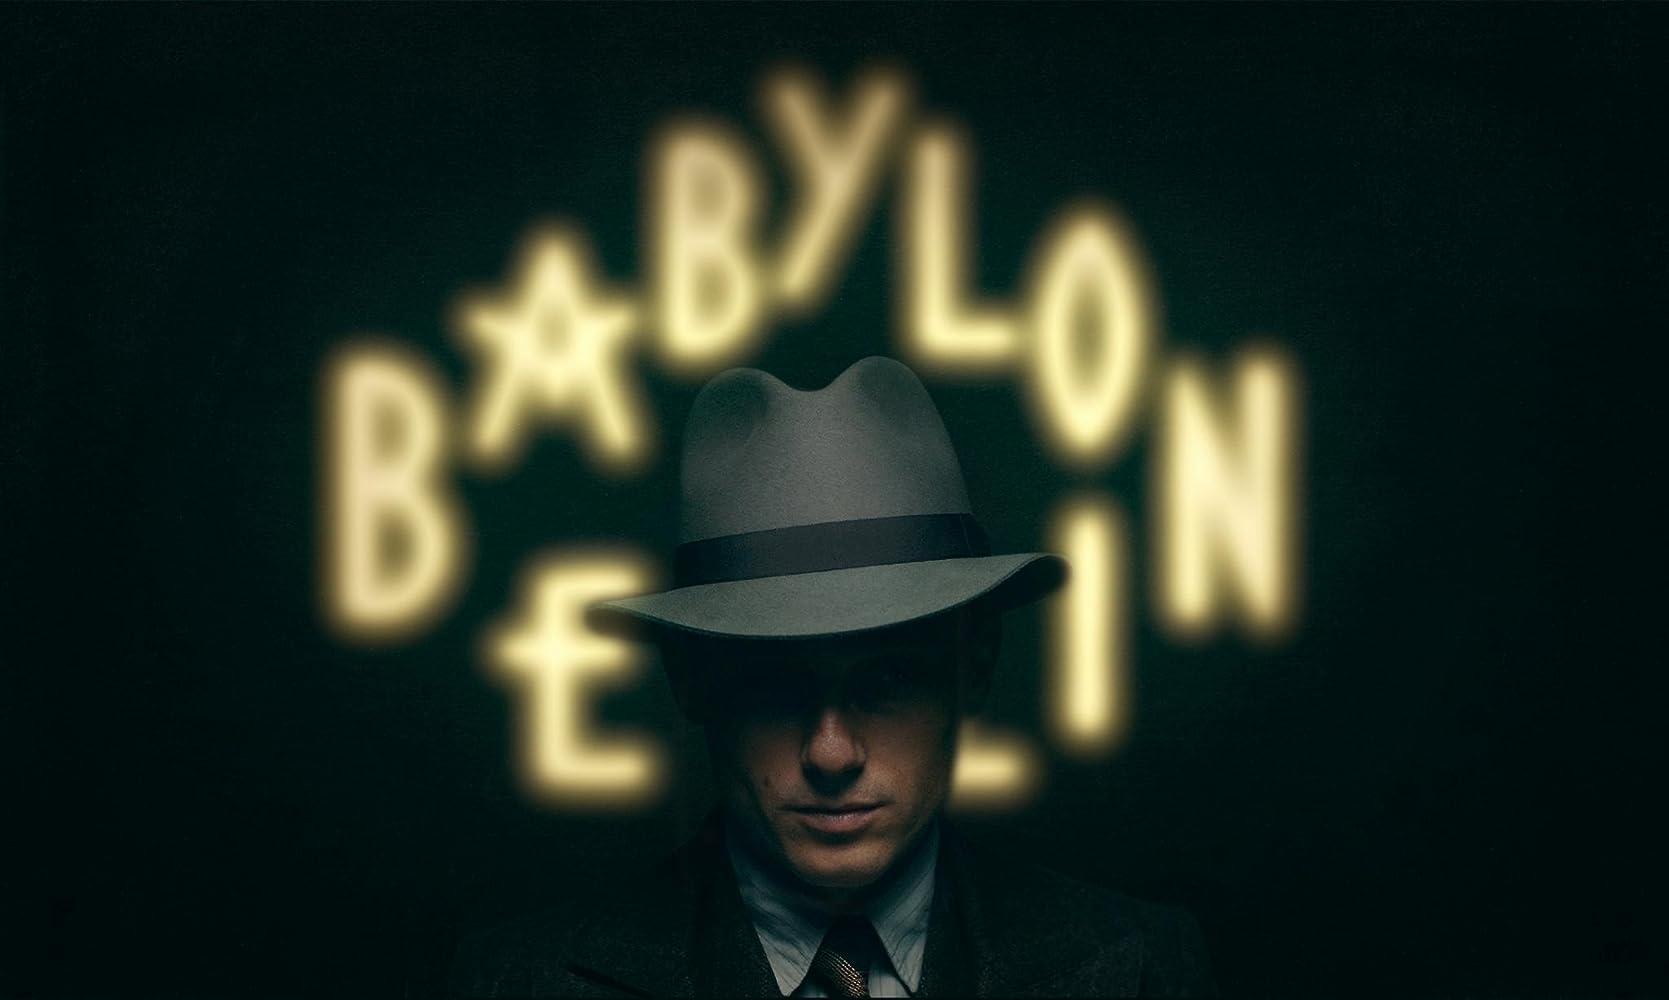 Volker Bruch in Babylon Berlin (2017)